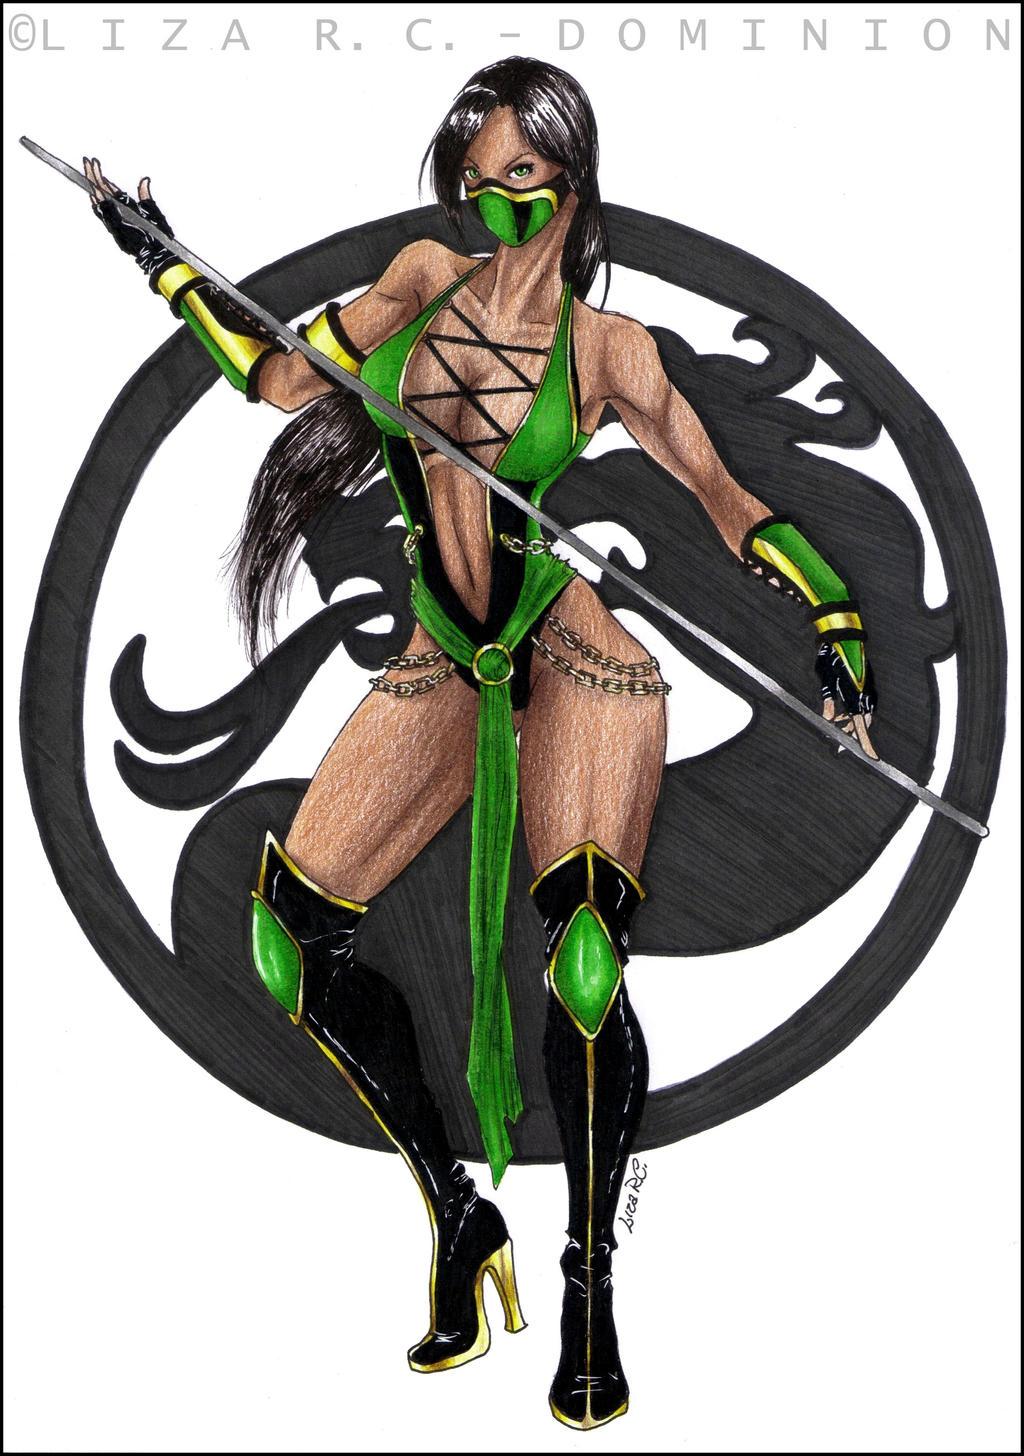 Kitana on Mortal-Kombat-Fans - DeviantArt